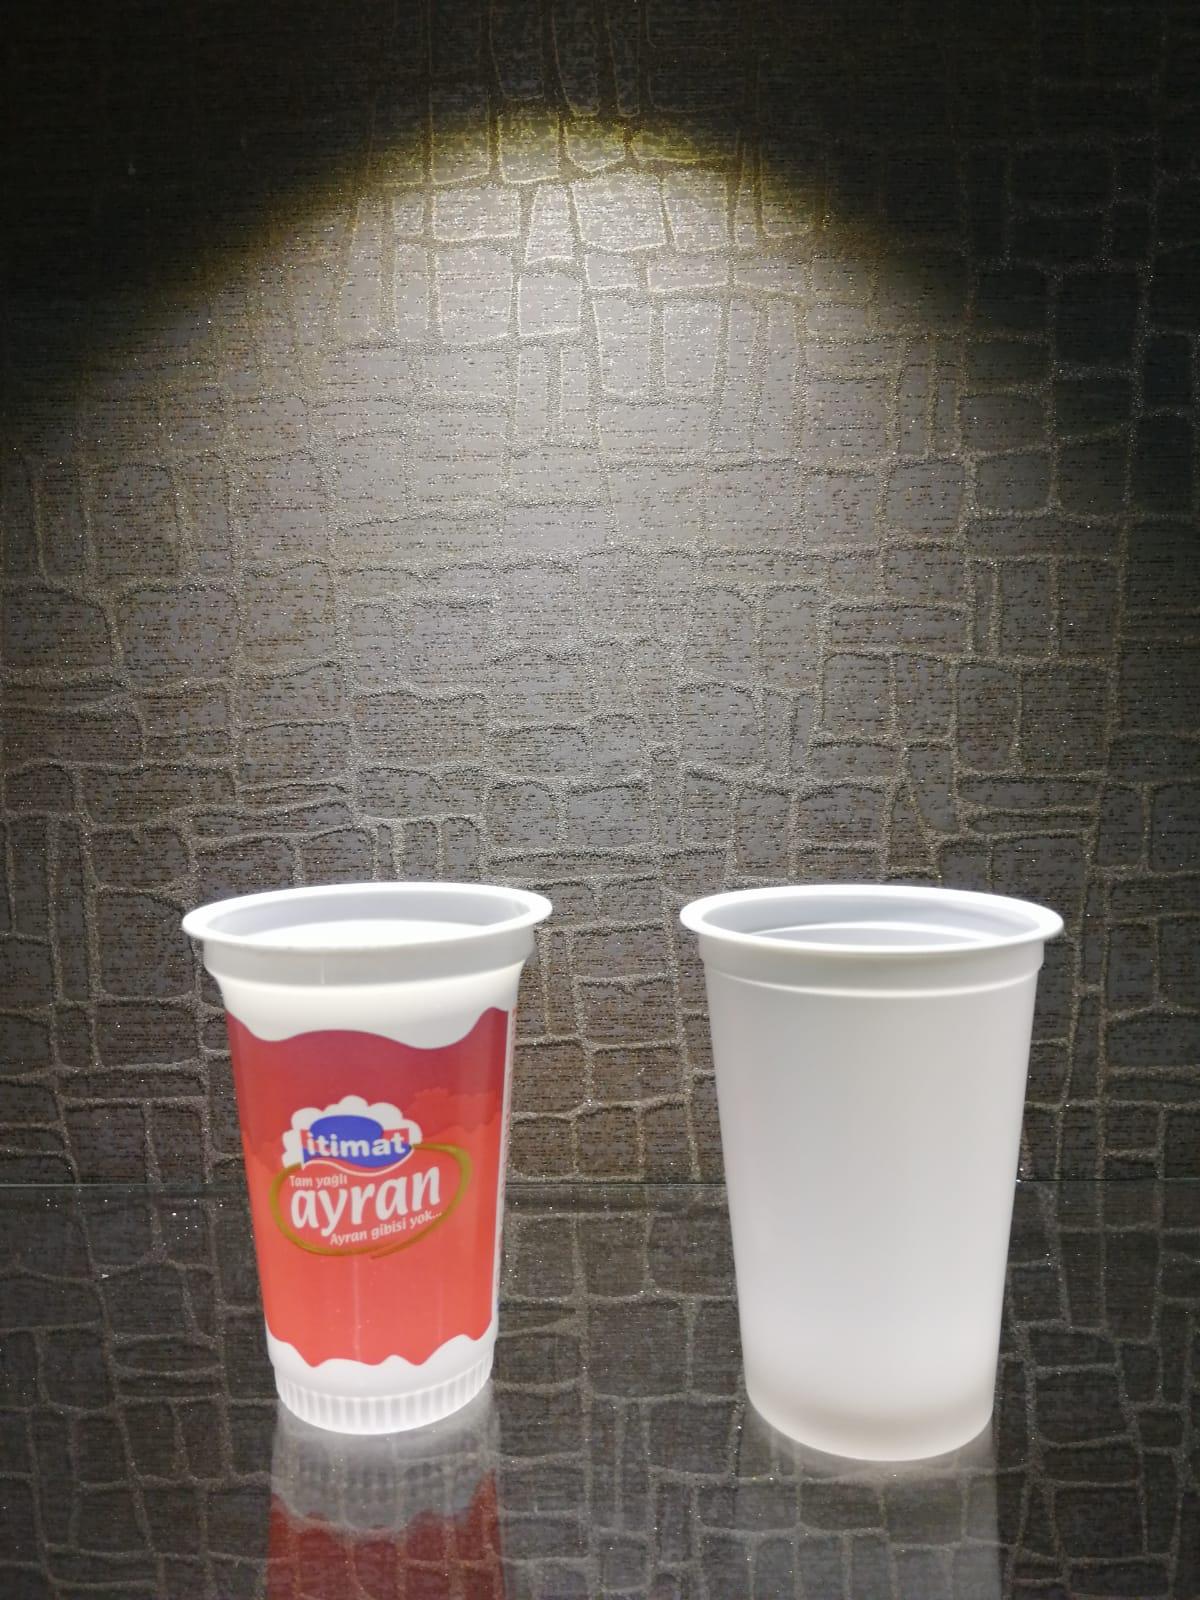 71/180  buttermilk cups